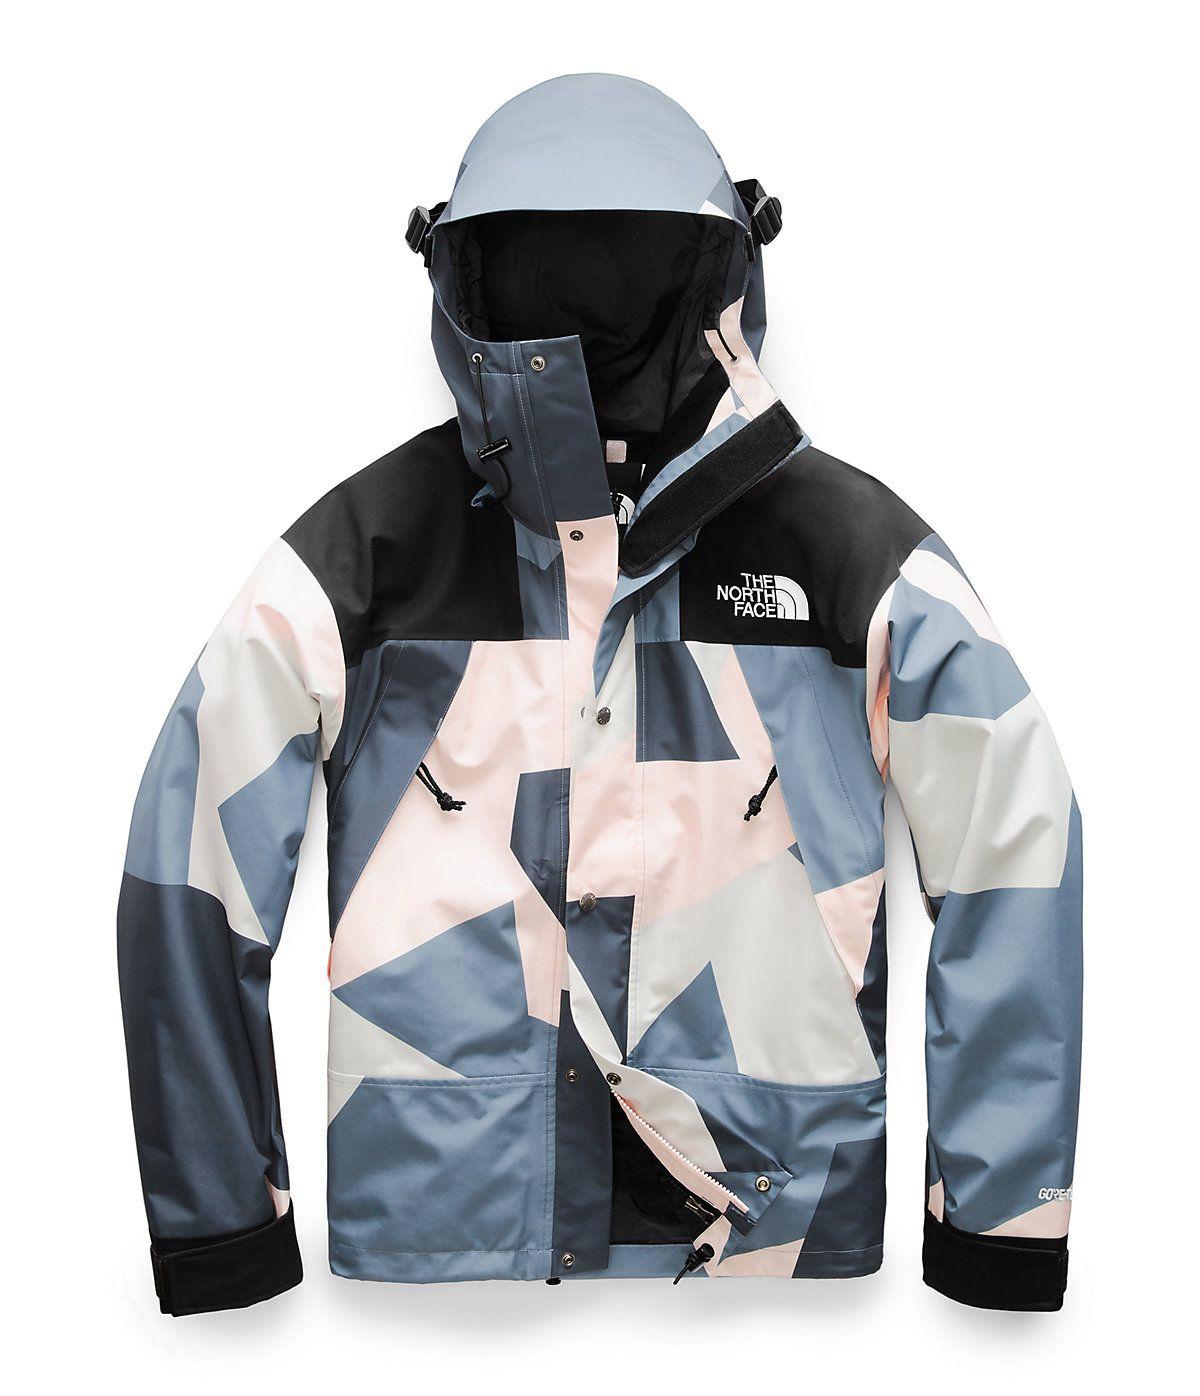 1994 Retro Mountain Light Futurelight Jacket The North Face In 2021 North Face Windbreaker Weatherproof Jacket Jackets [ 1396 x 1200 Pixel ]